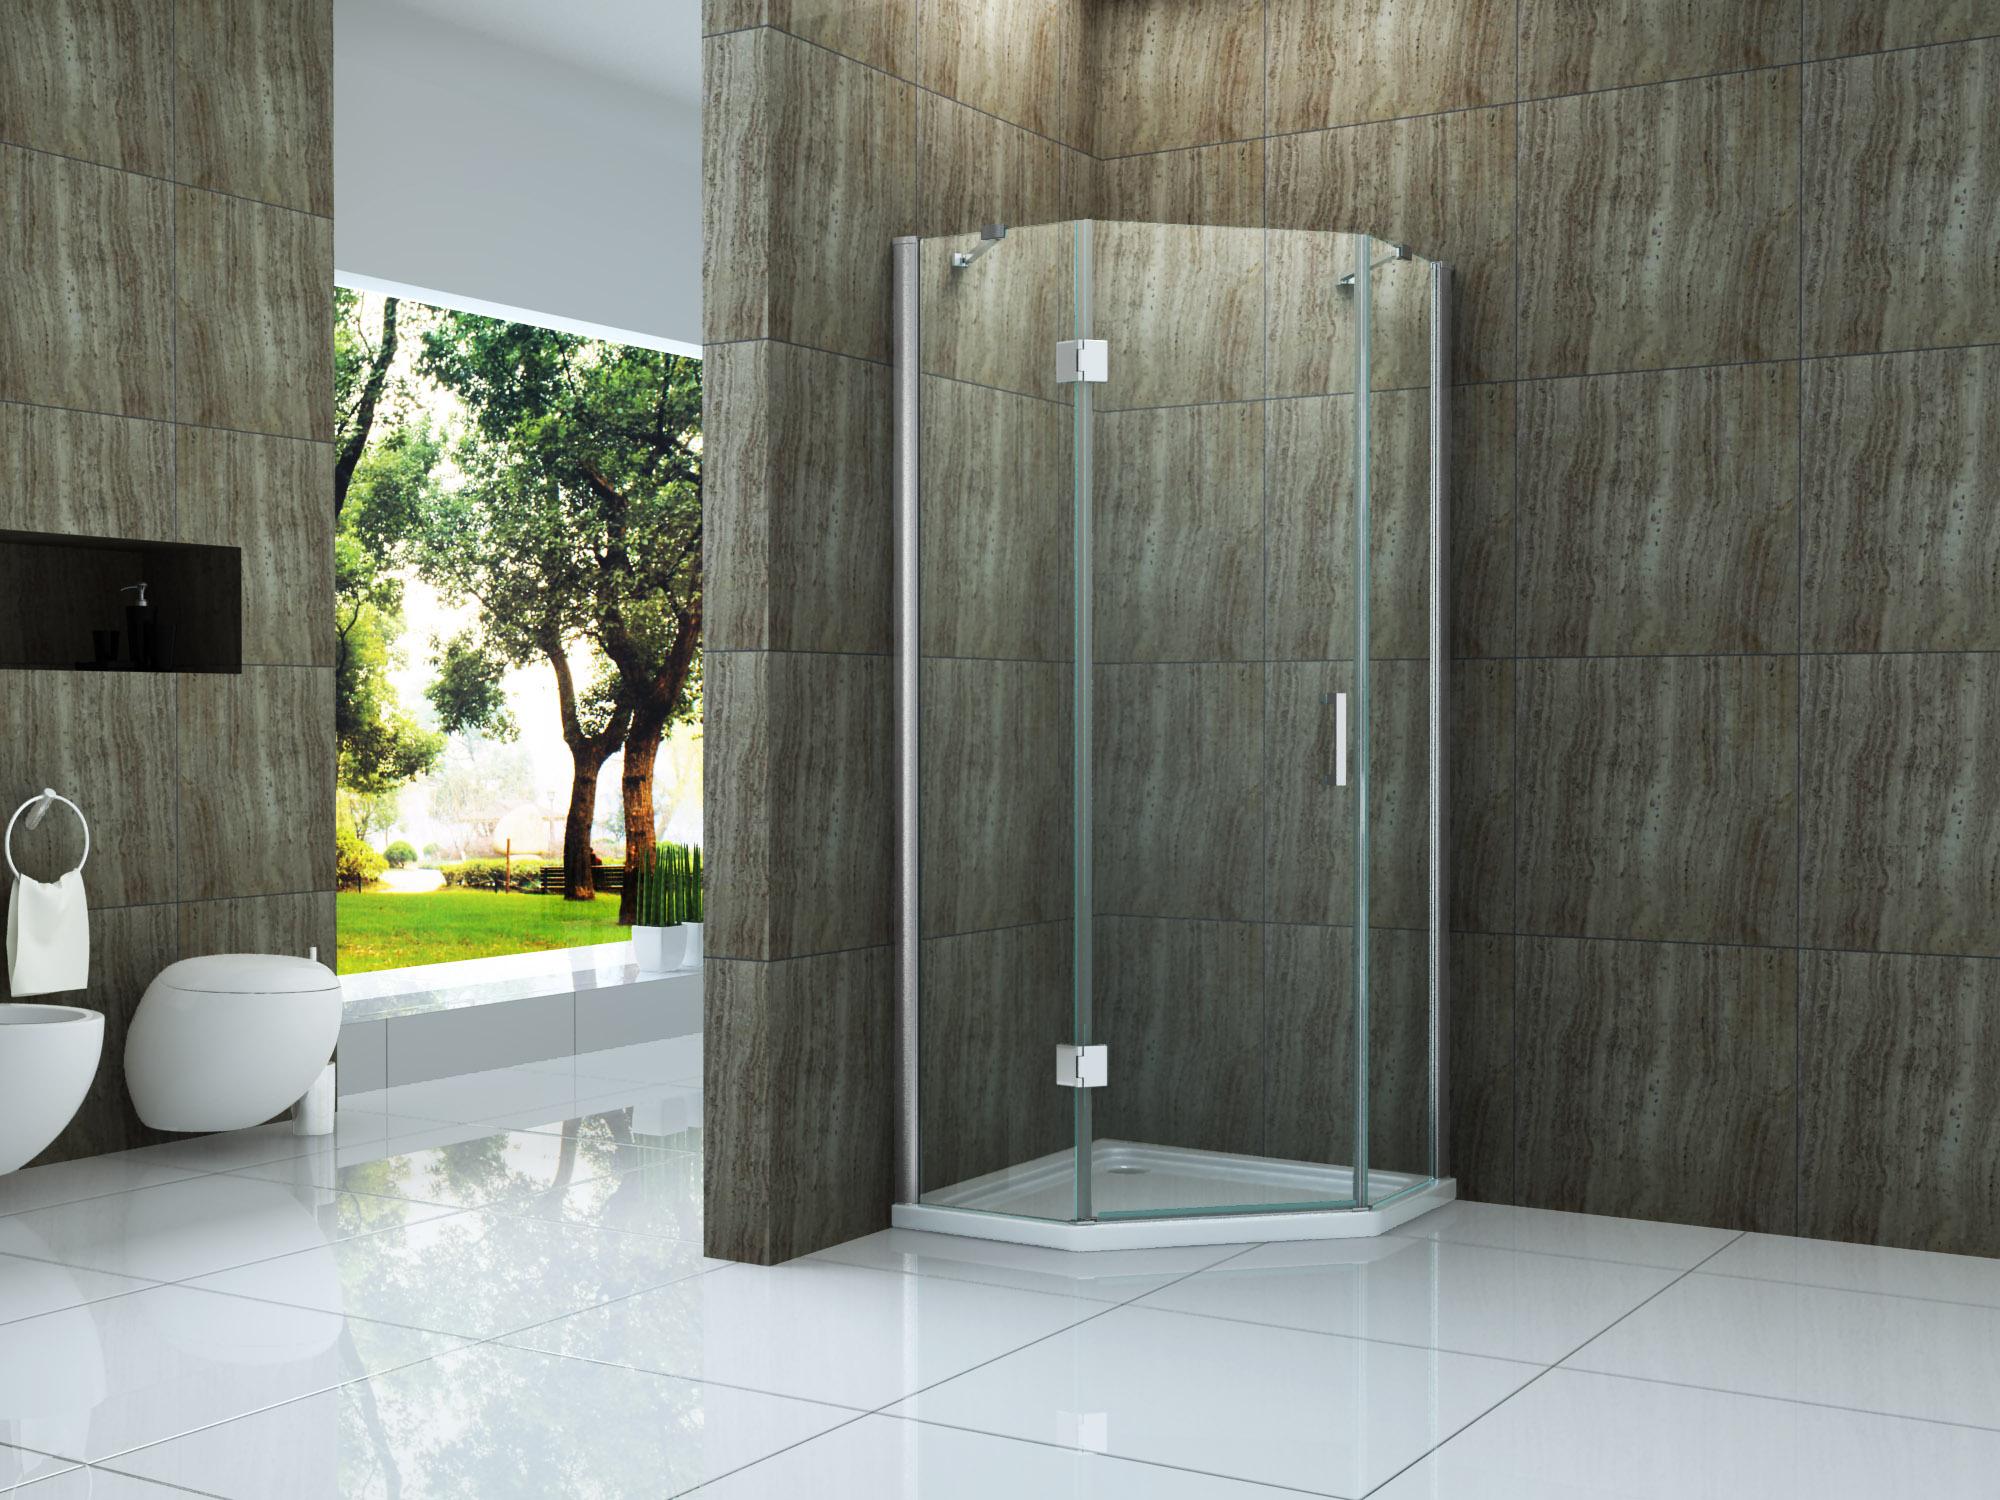 Fünfeck-Duschkabine NOOK 90 x 90 x 200 cm inkl. Duschtasse